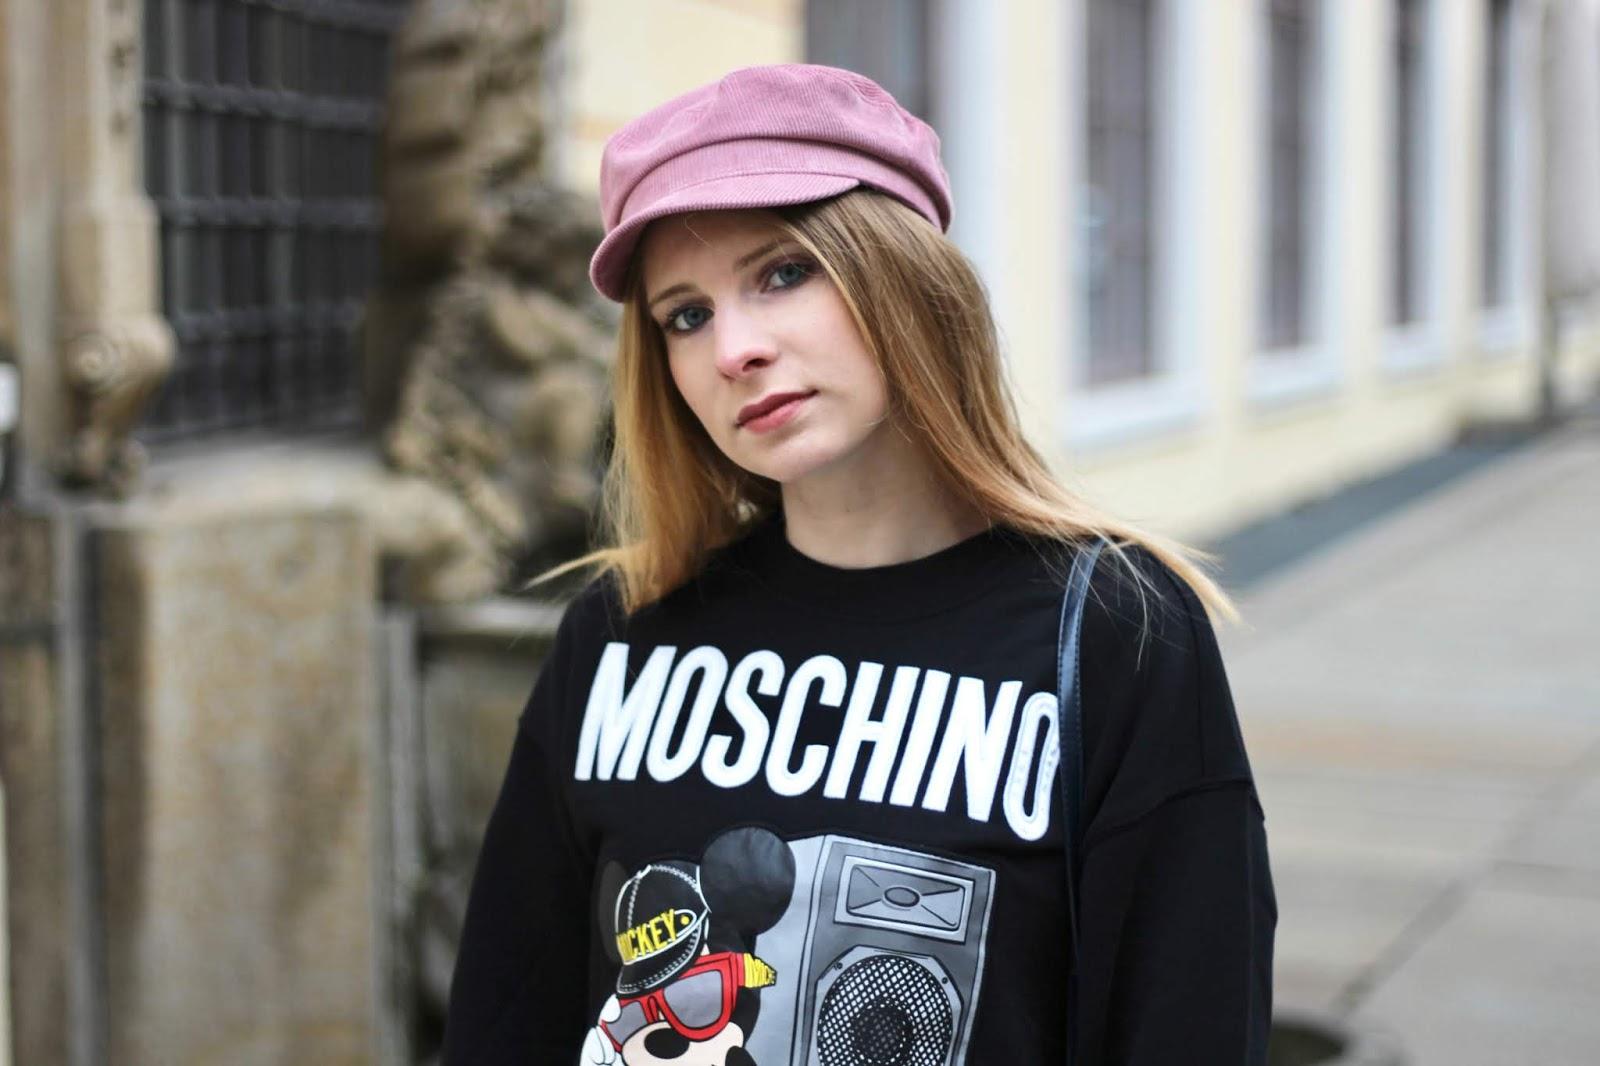 kaufen damen echte Schuhe Outfit: H&M x Moschino Mickey Mouse Sweater | The ...